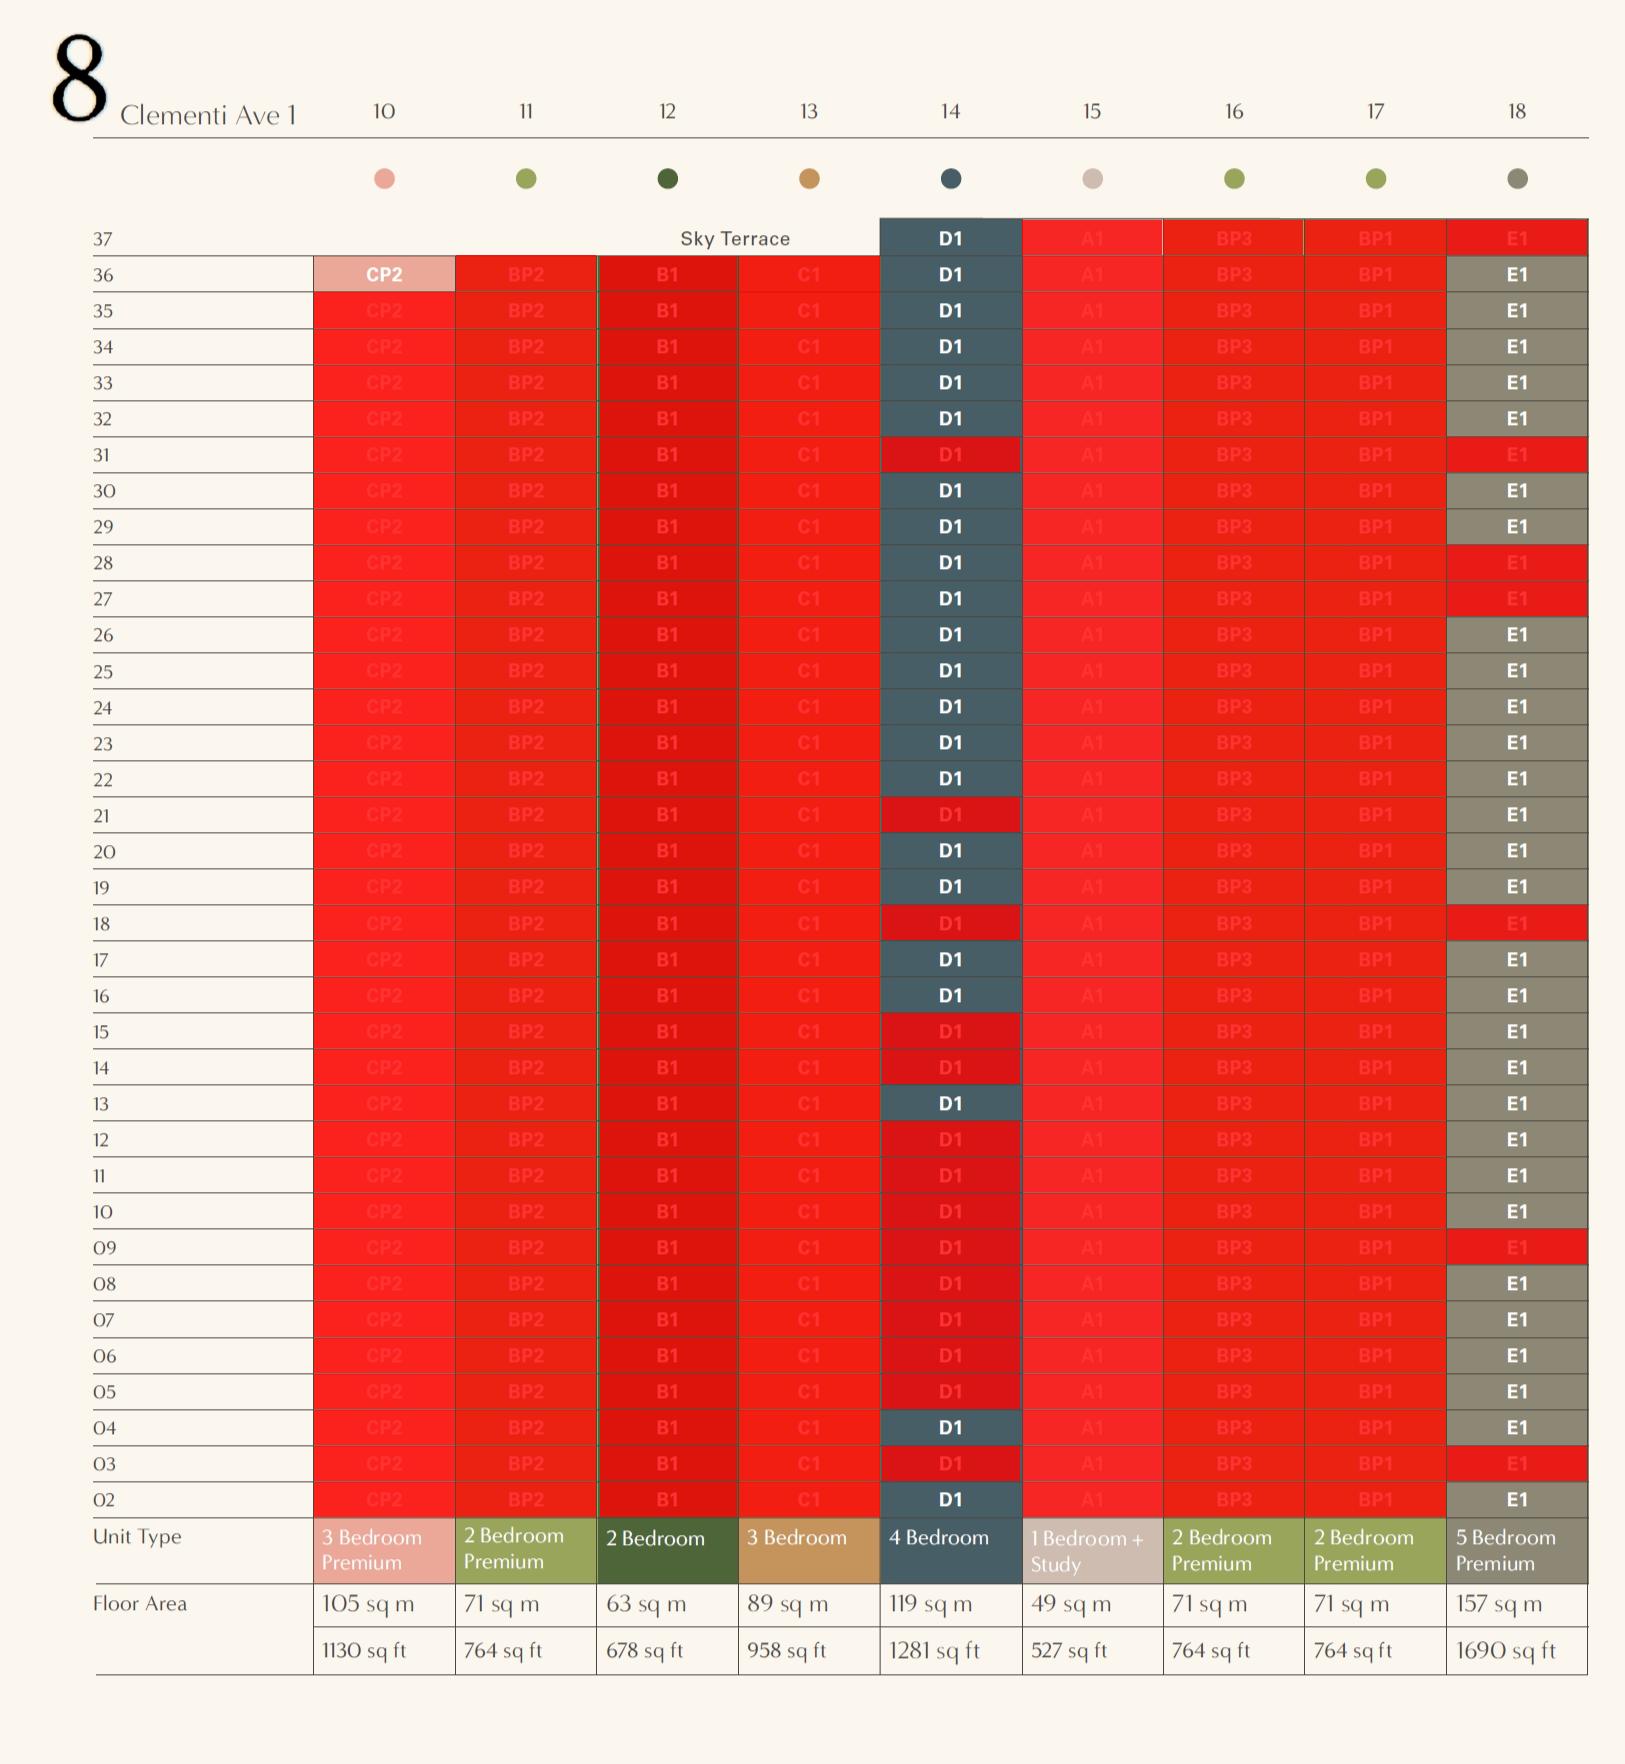 Clavon-Balance-Units-Chart-Blk-8-270521